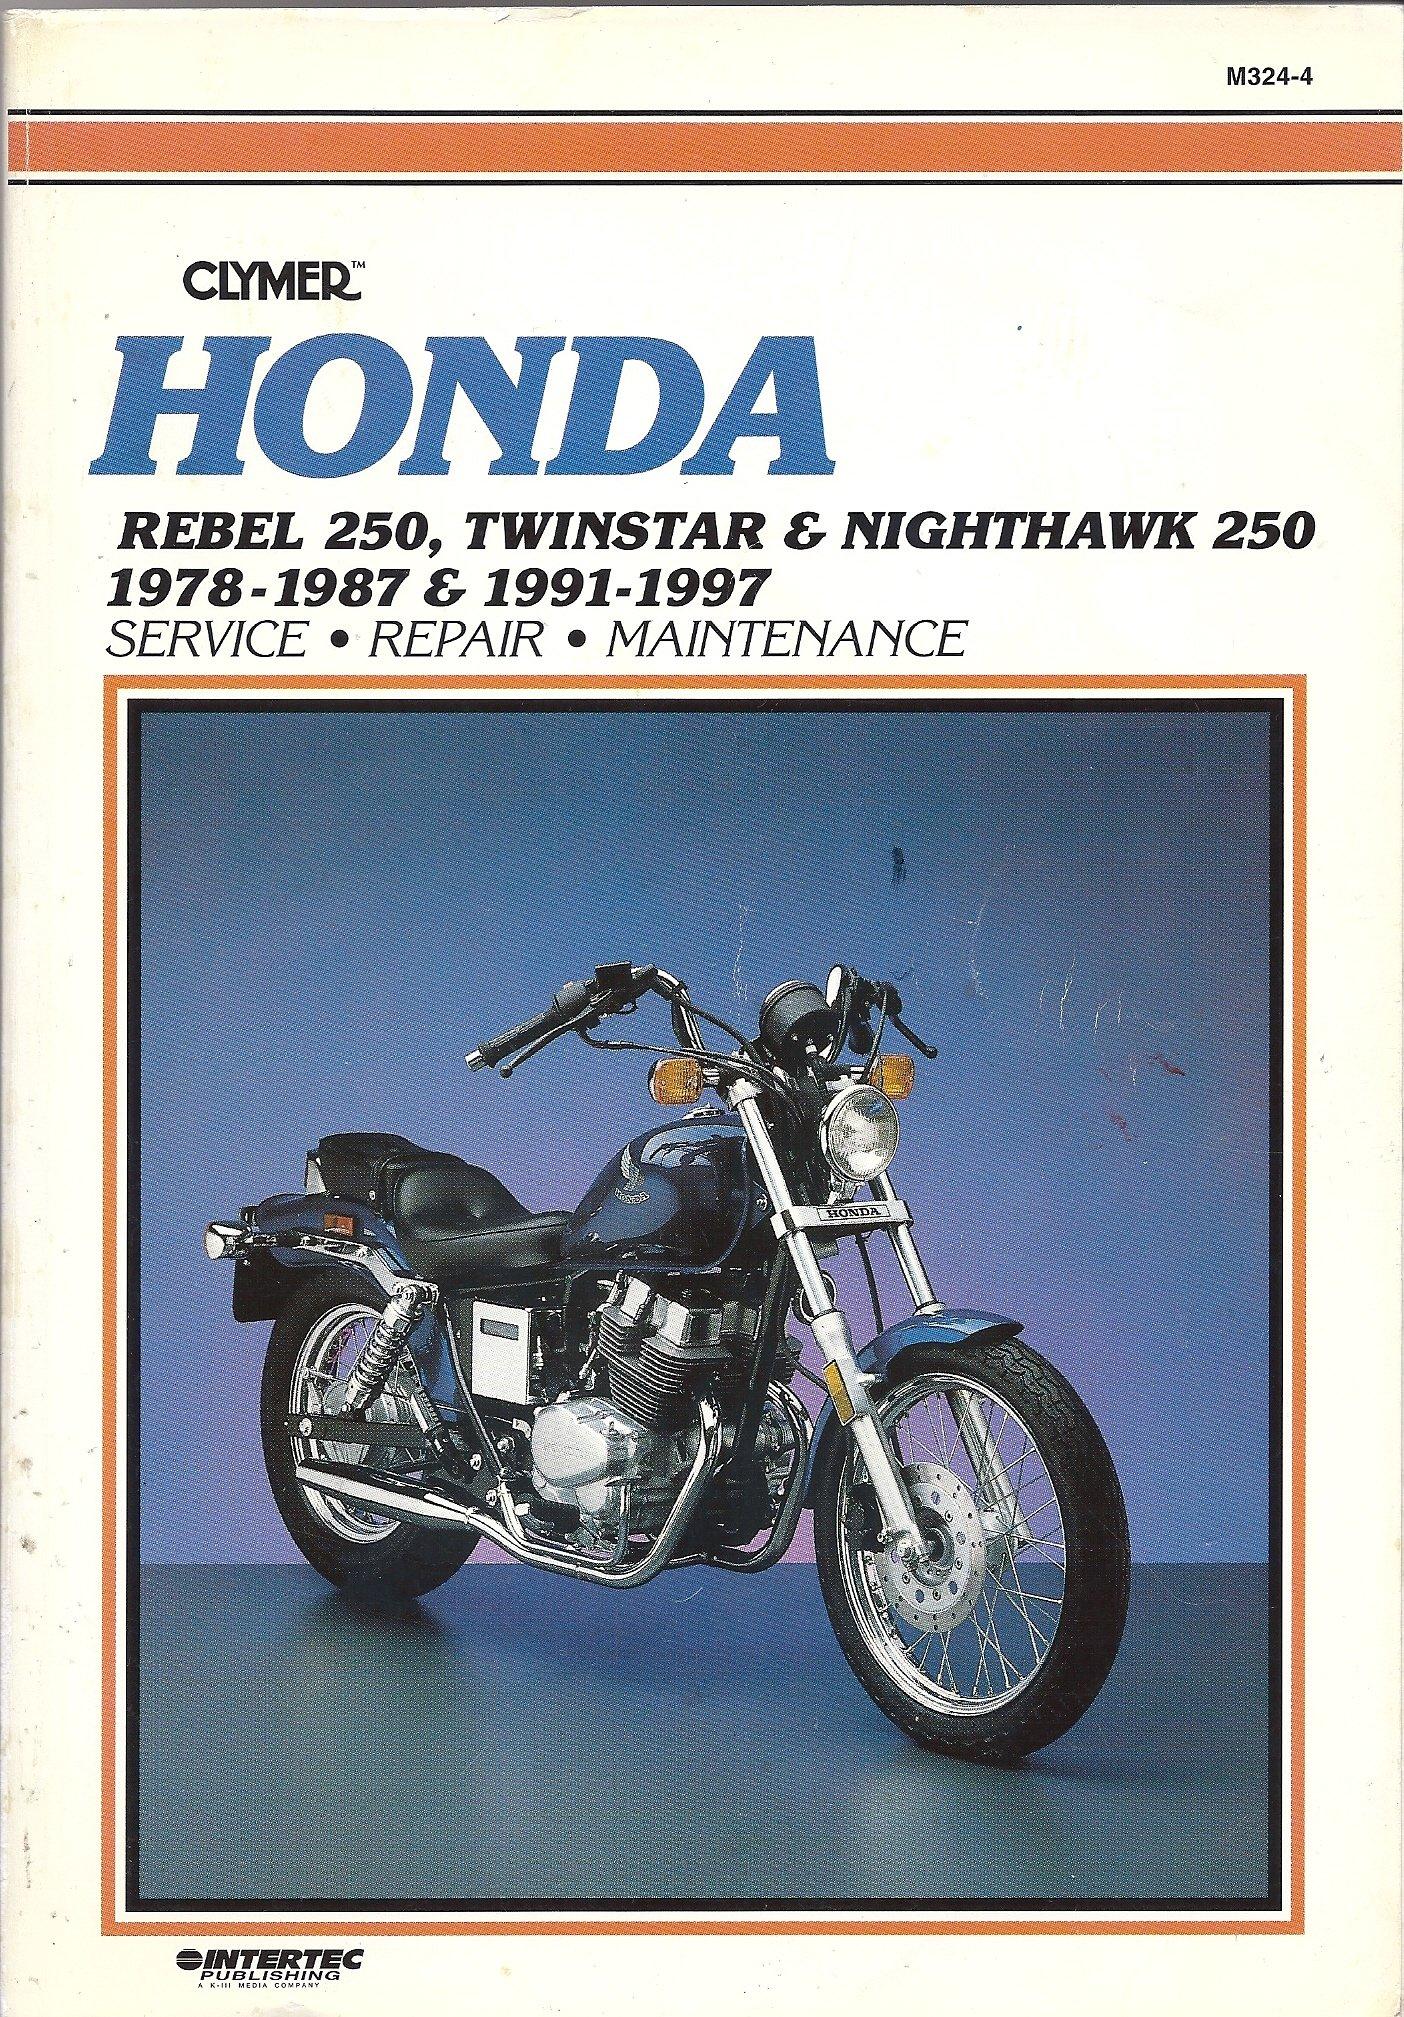 Honda Rebel 250, Twinstar & Nighthawk 1978-1997 & 1991-1997: Ed Scott:  9780892877102: Amazon.com: Books